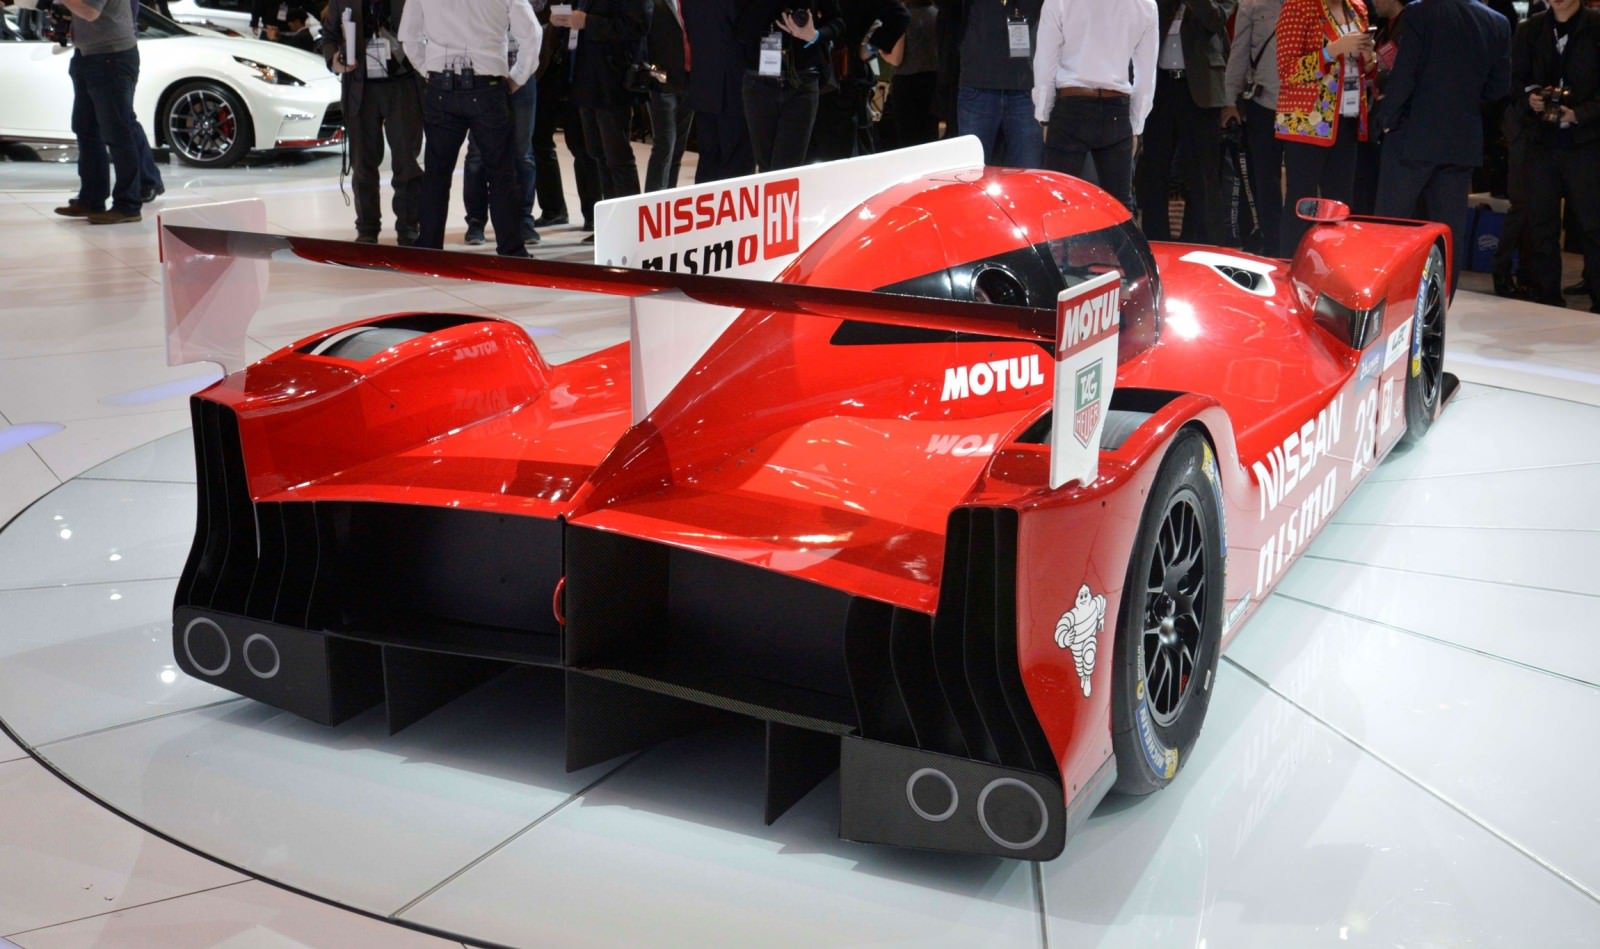 2015 Nissan GT-R LM Nismo 12